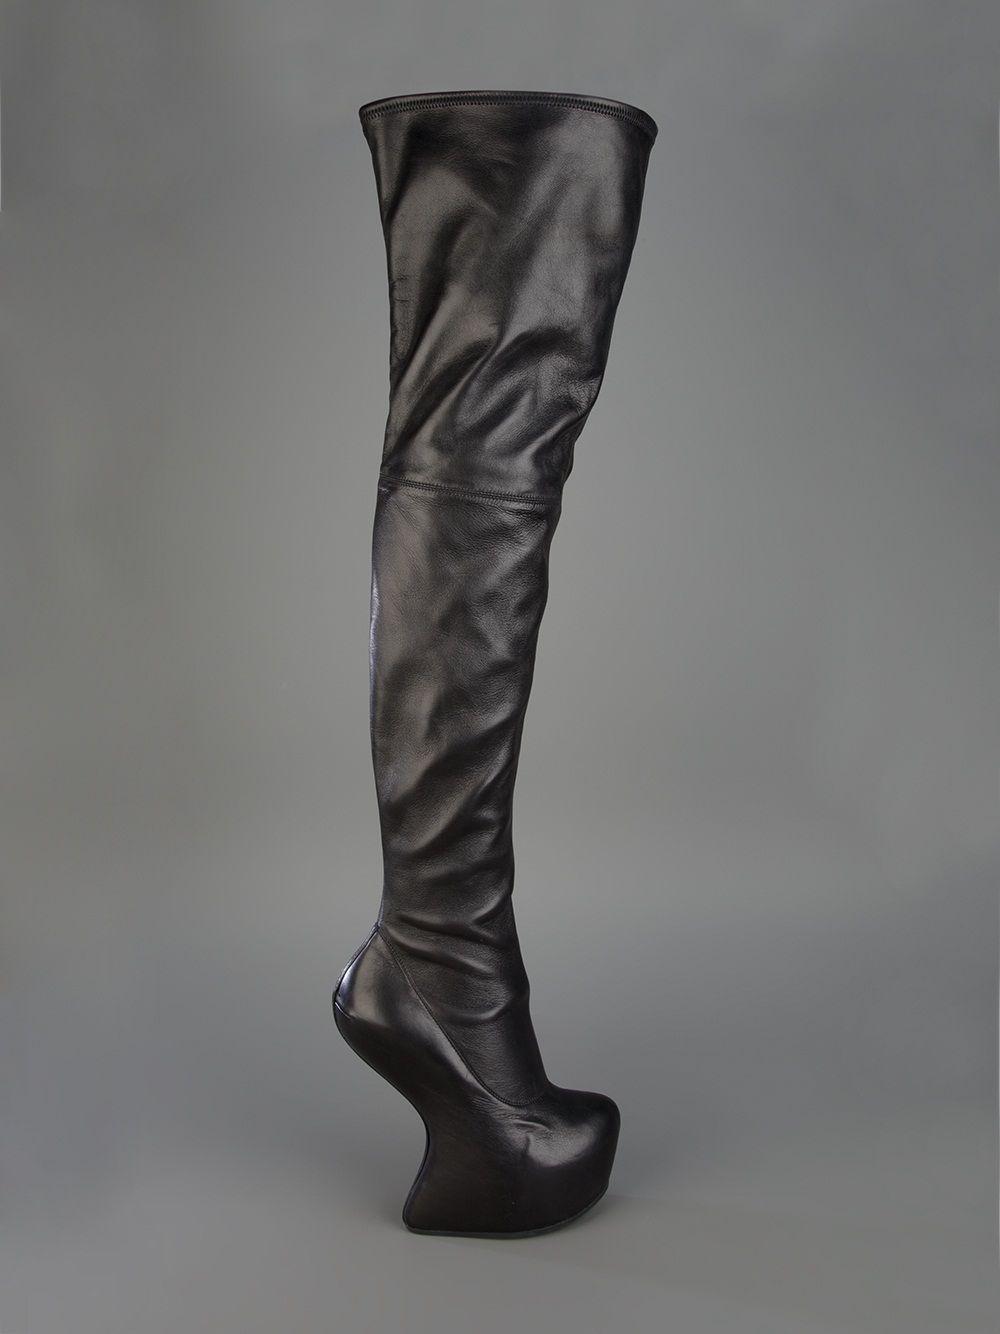 4da83a643328 Black leather thigh high boot from Giuseppe Zanotti design featuring an  almond toe